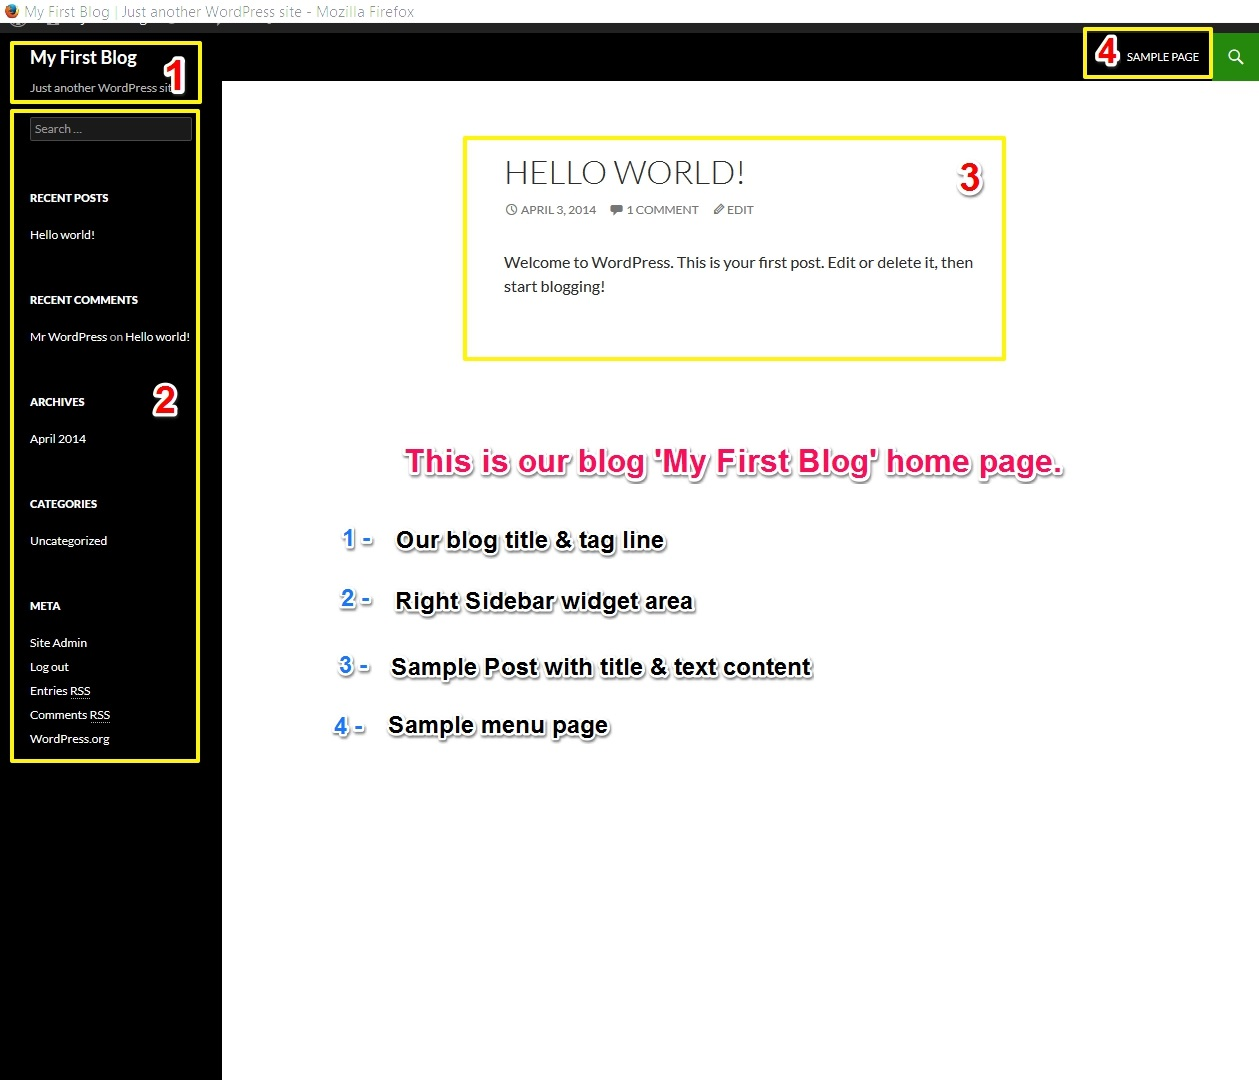 WordPress Bog Home Page